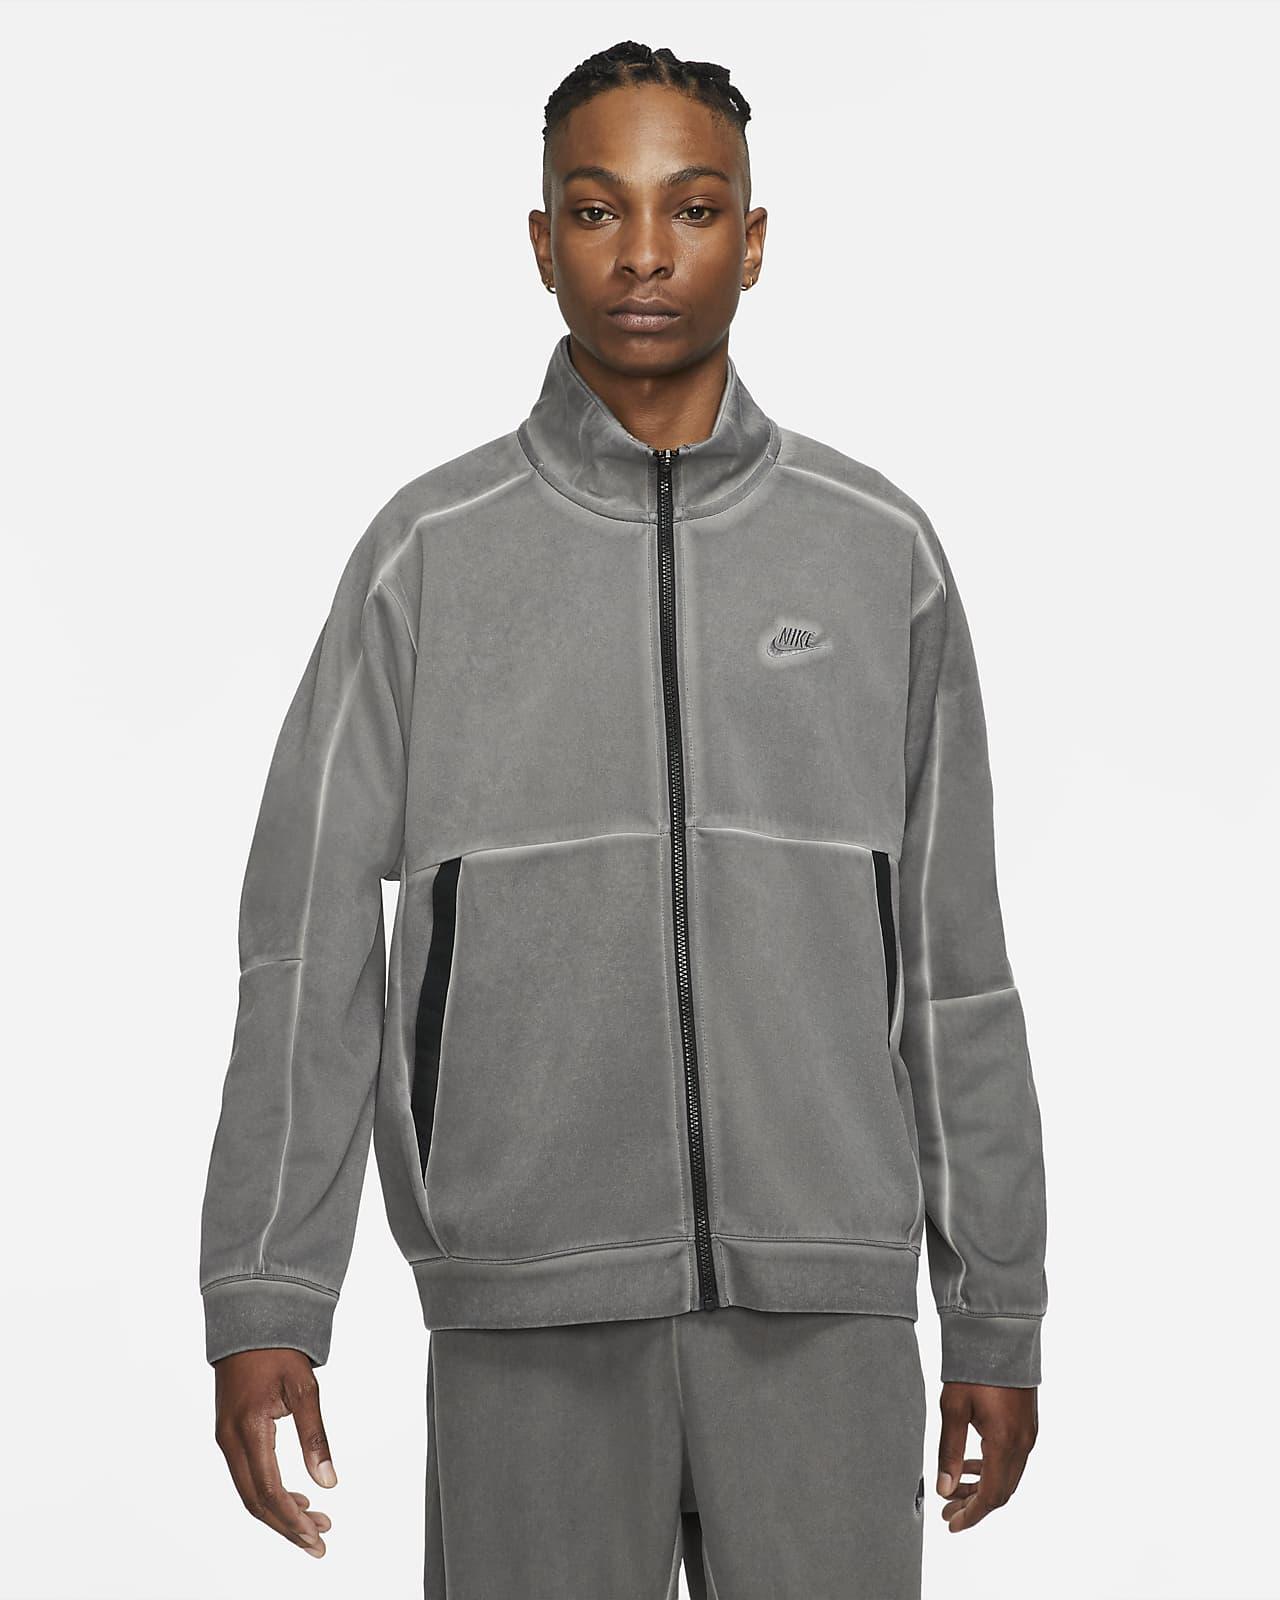 Nike Sportswear 男子针织夹克